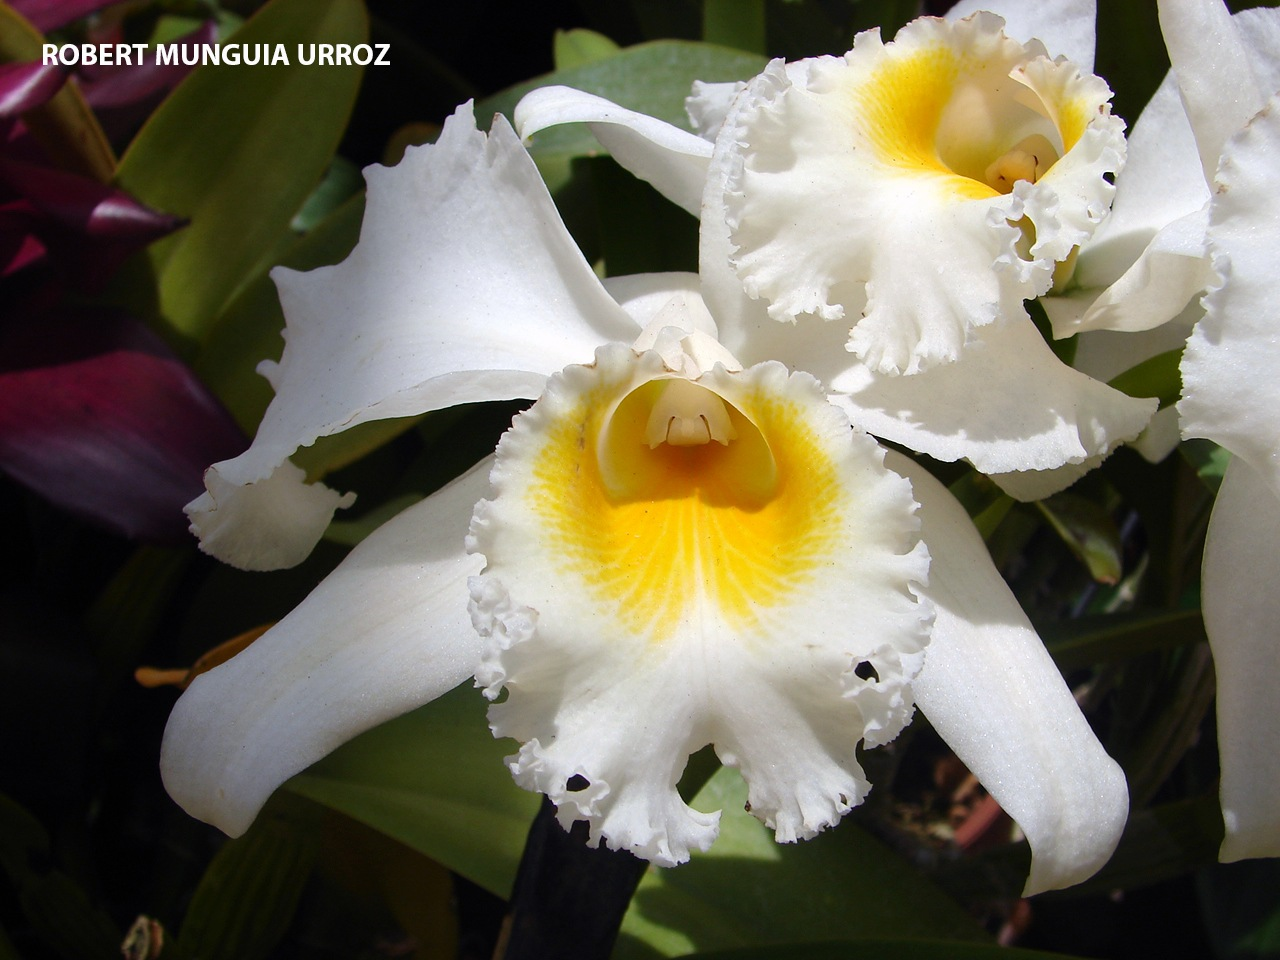 FLOWERS by Robert Munguia